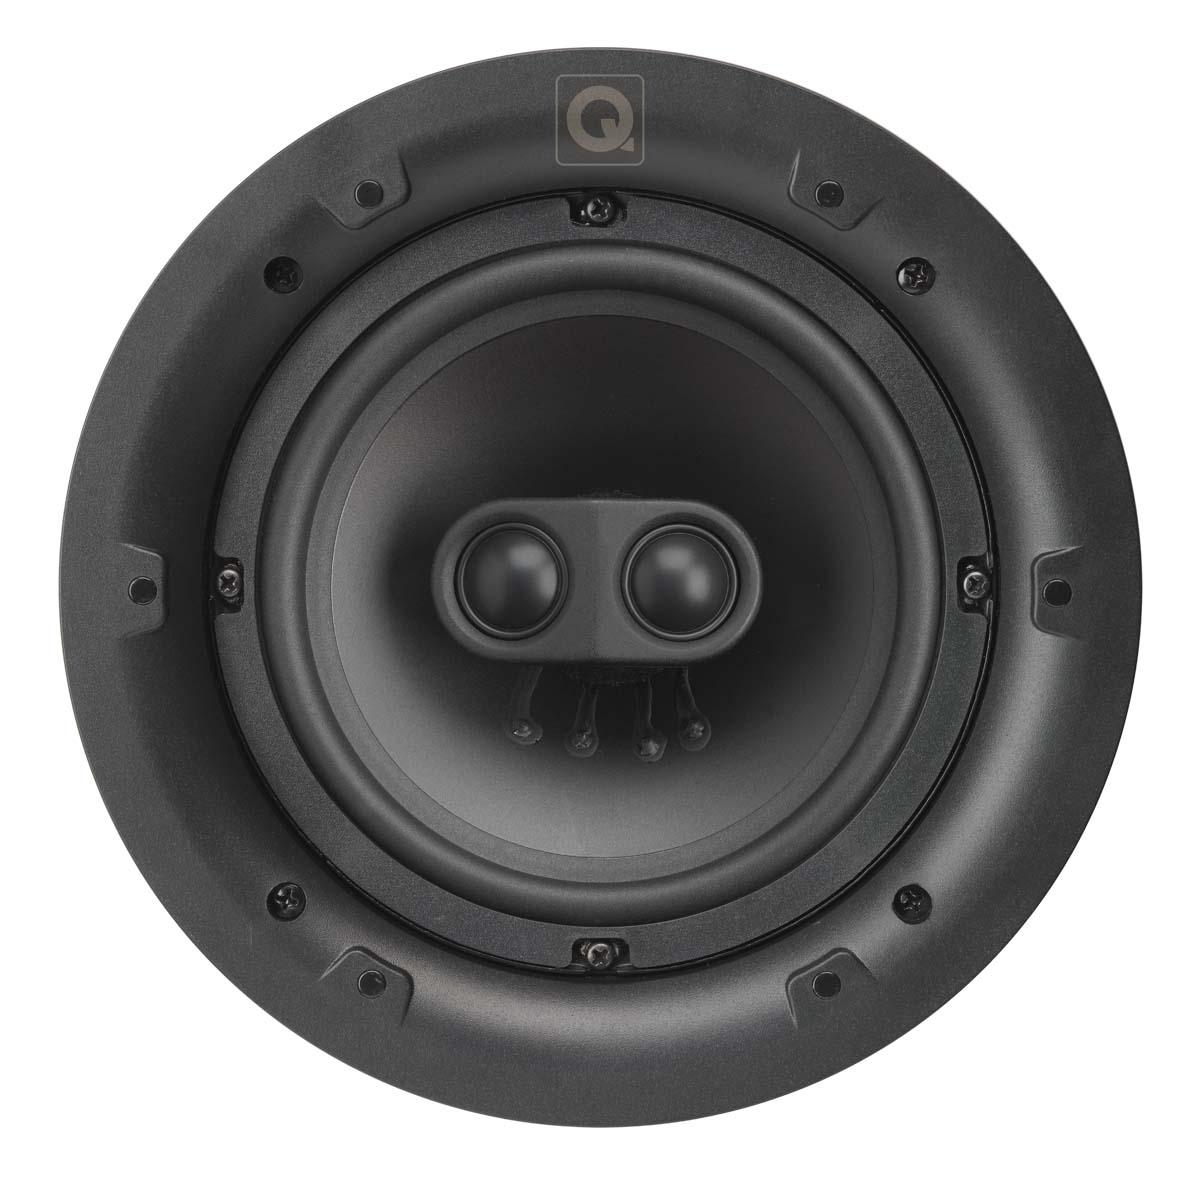 Q-Acoustics Qi65S STEREO Decken-Lautsprecher